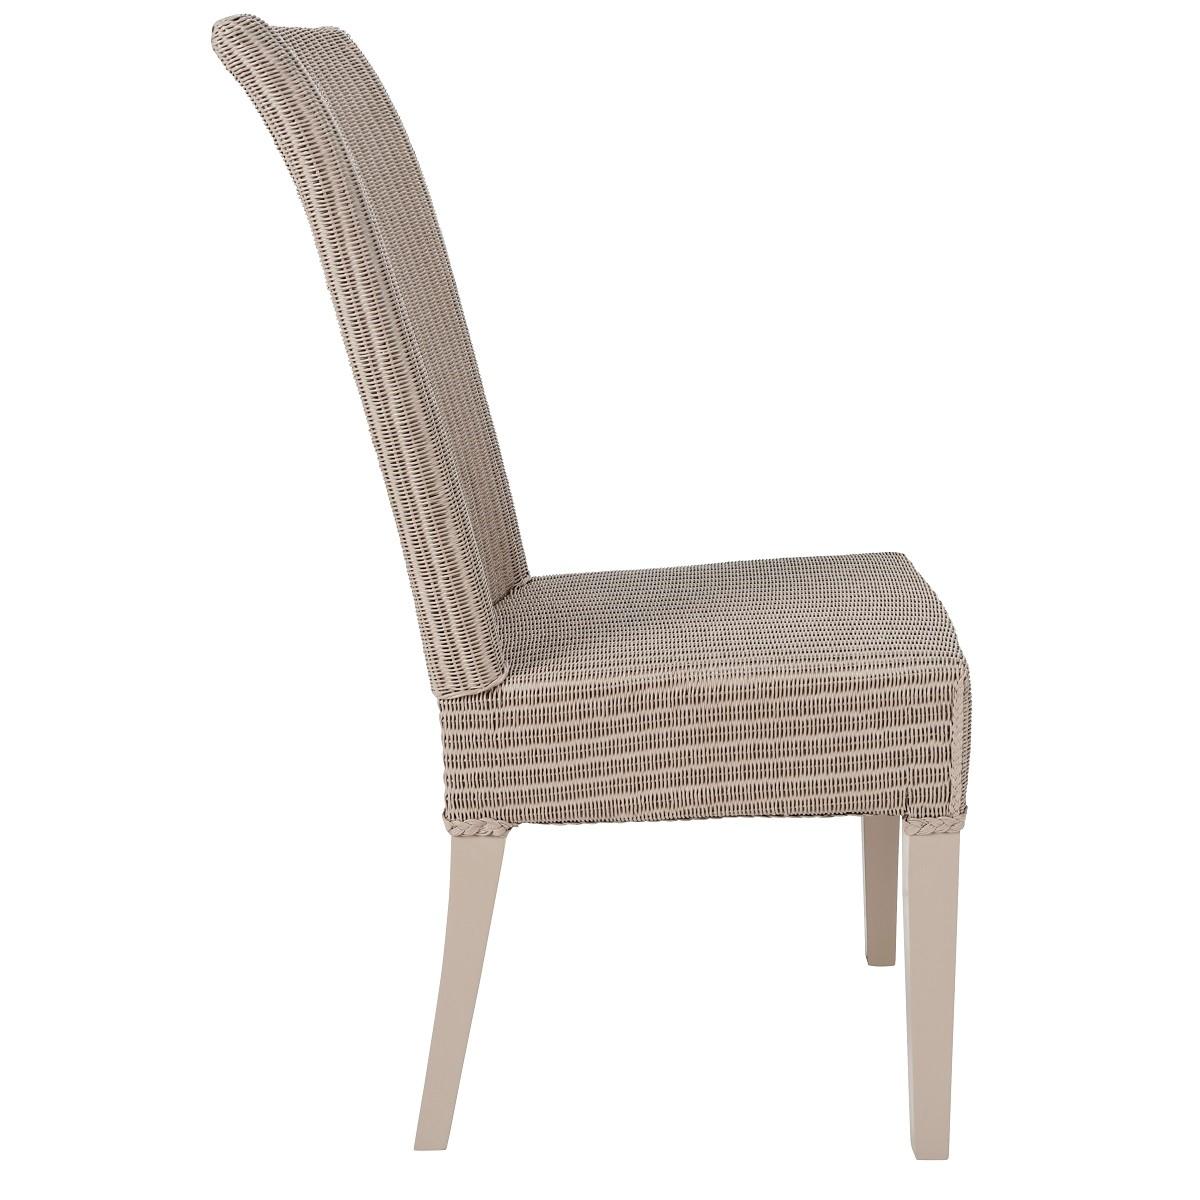 Chaise en Lloyd Loom laqué gris